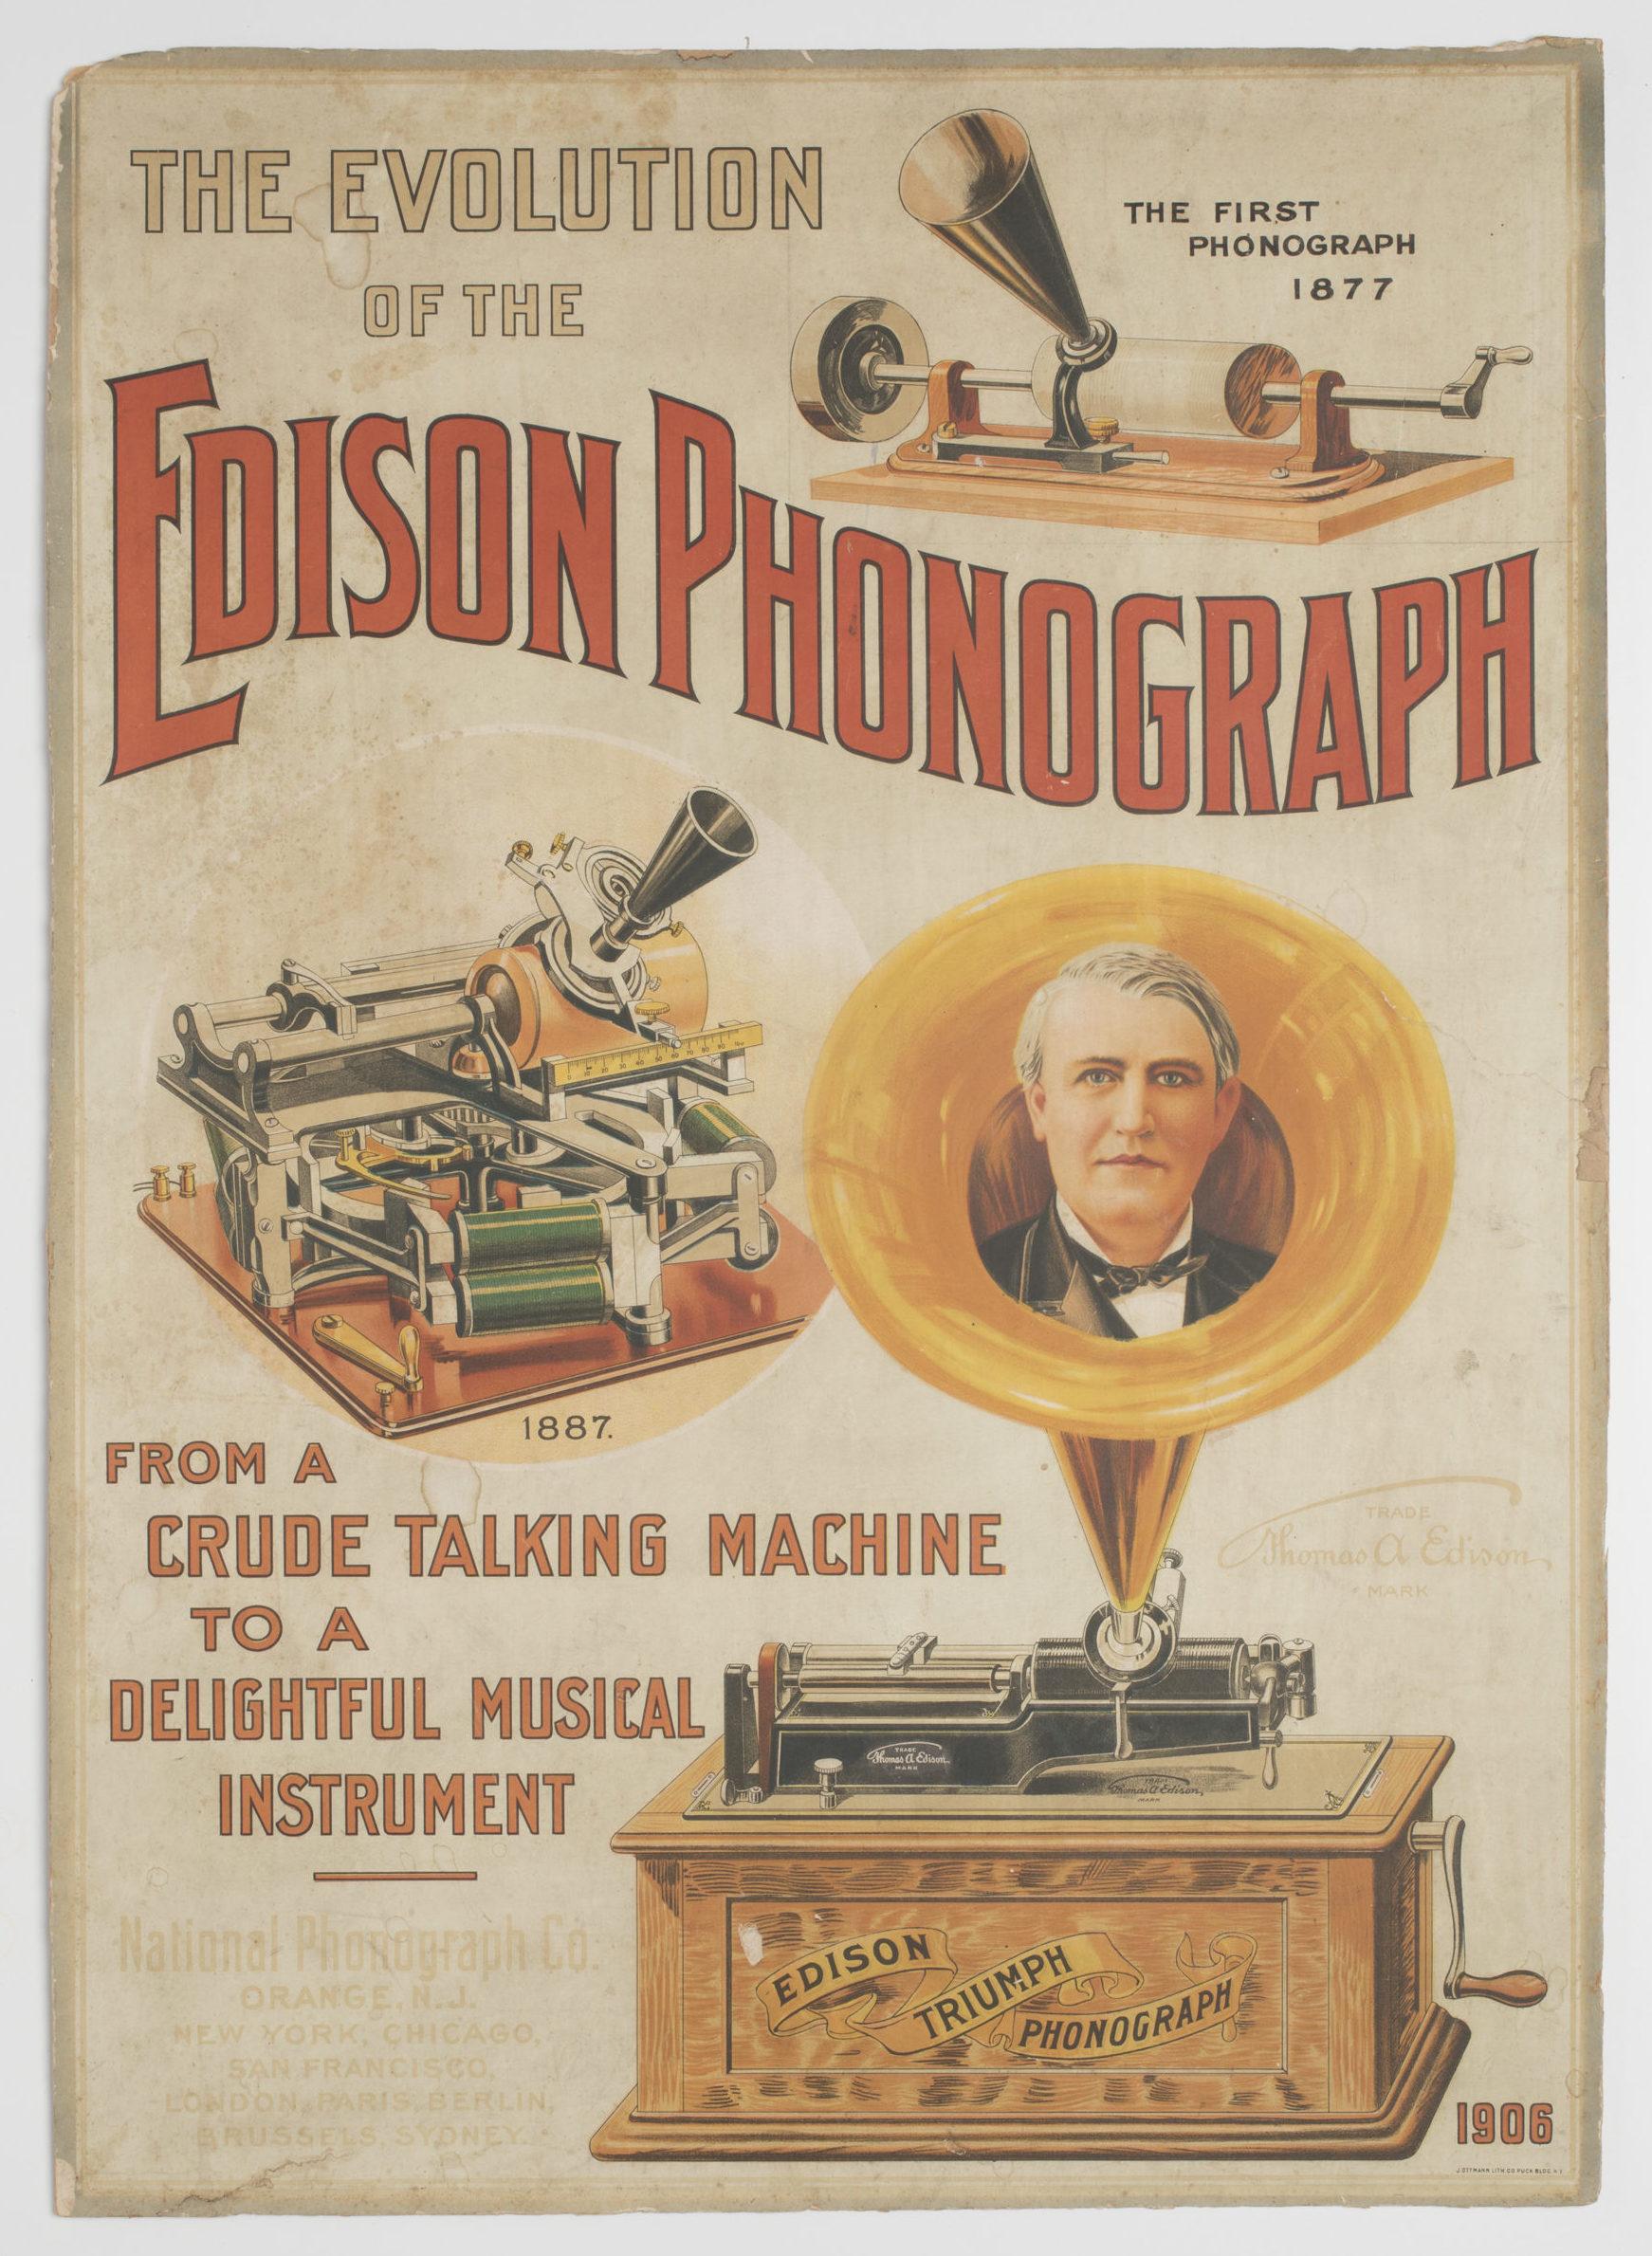 Lithograph, poster, Edison Phonograph, J Ottman, USA, c 1906